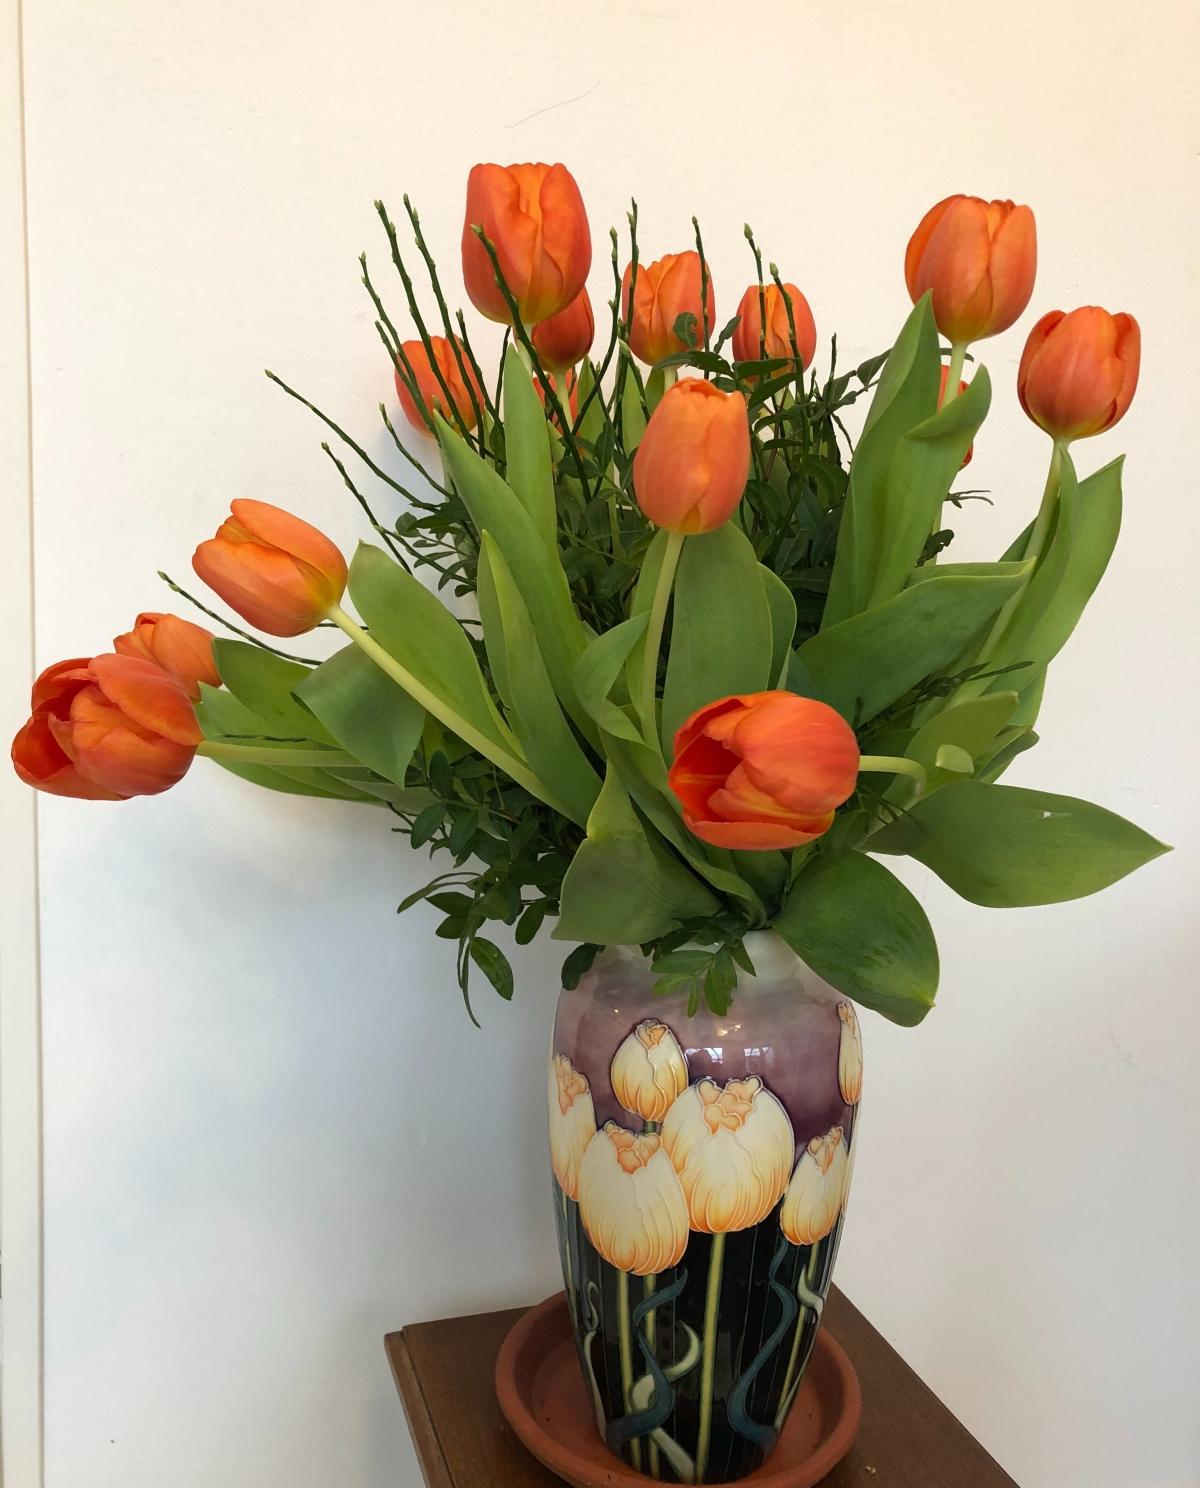 Monday the same tulips